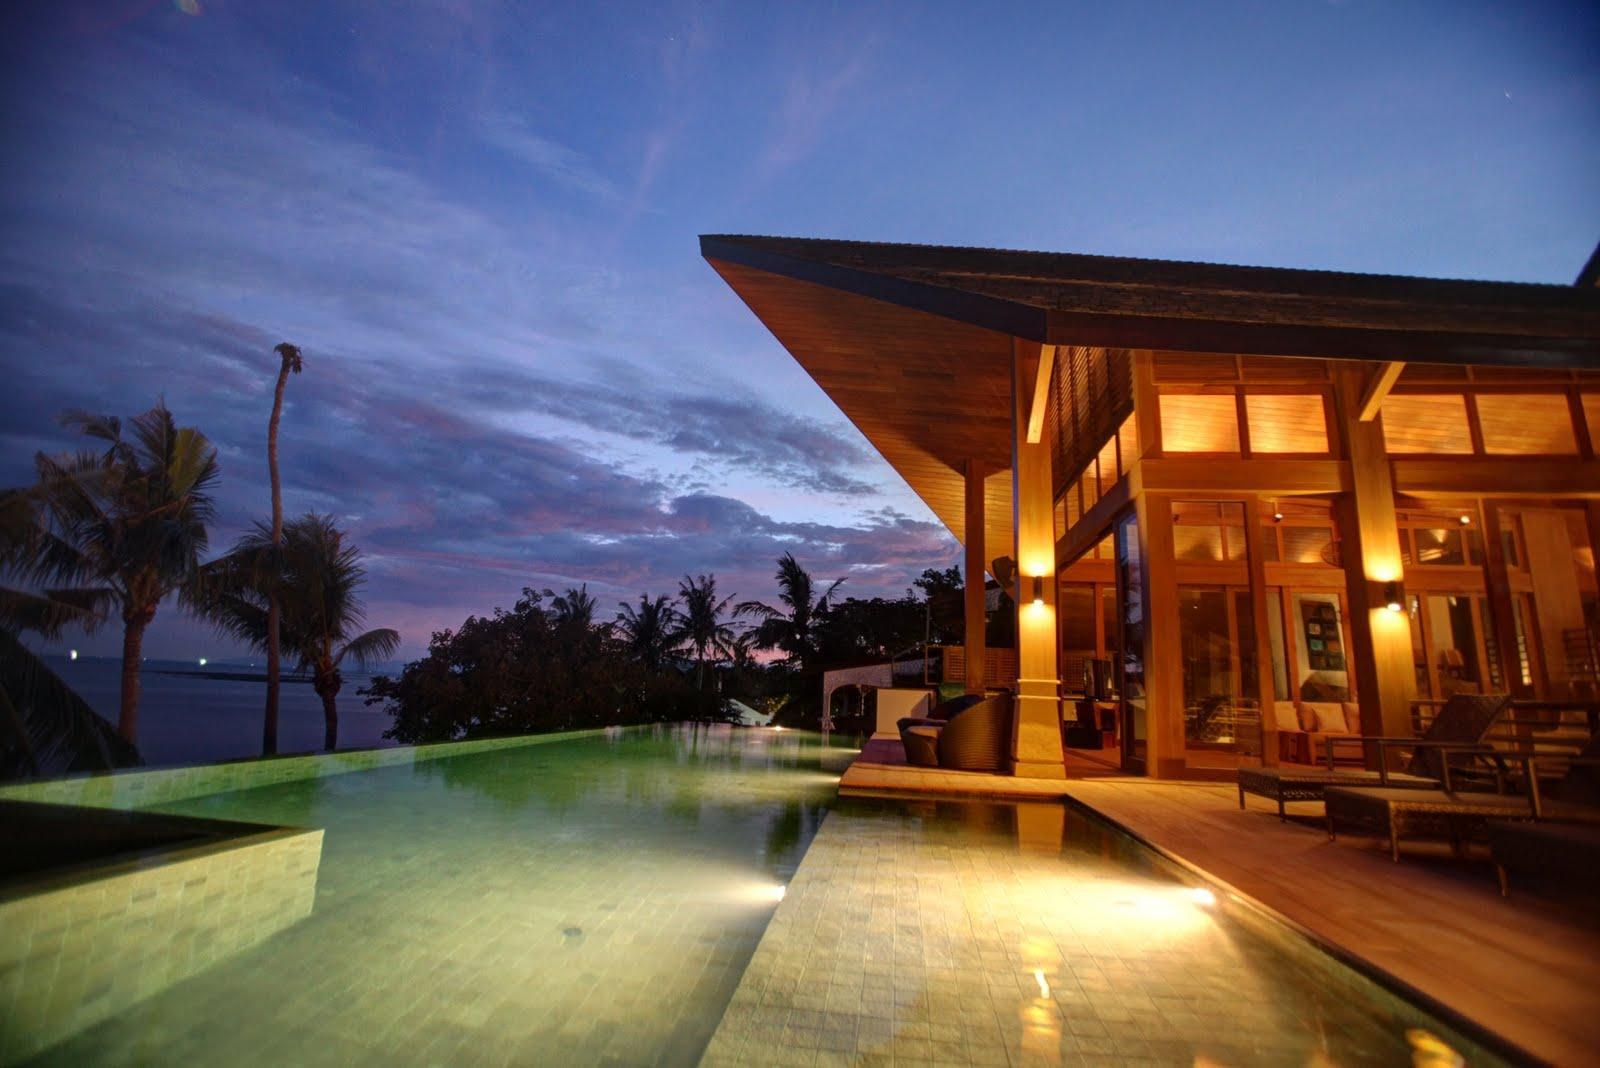 BHT   5 Bedroom Beachfront Villa With Private Pool